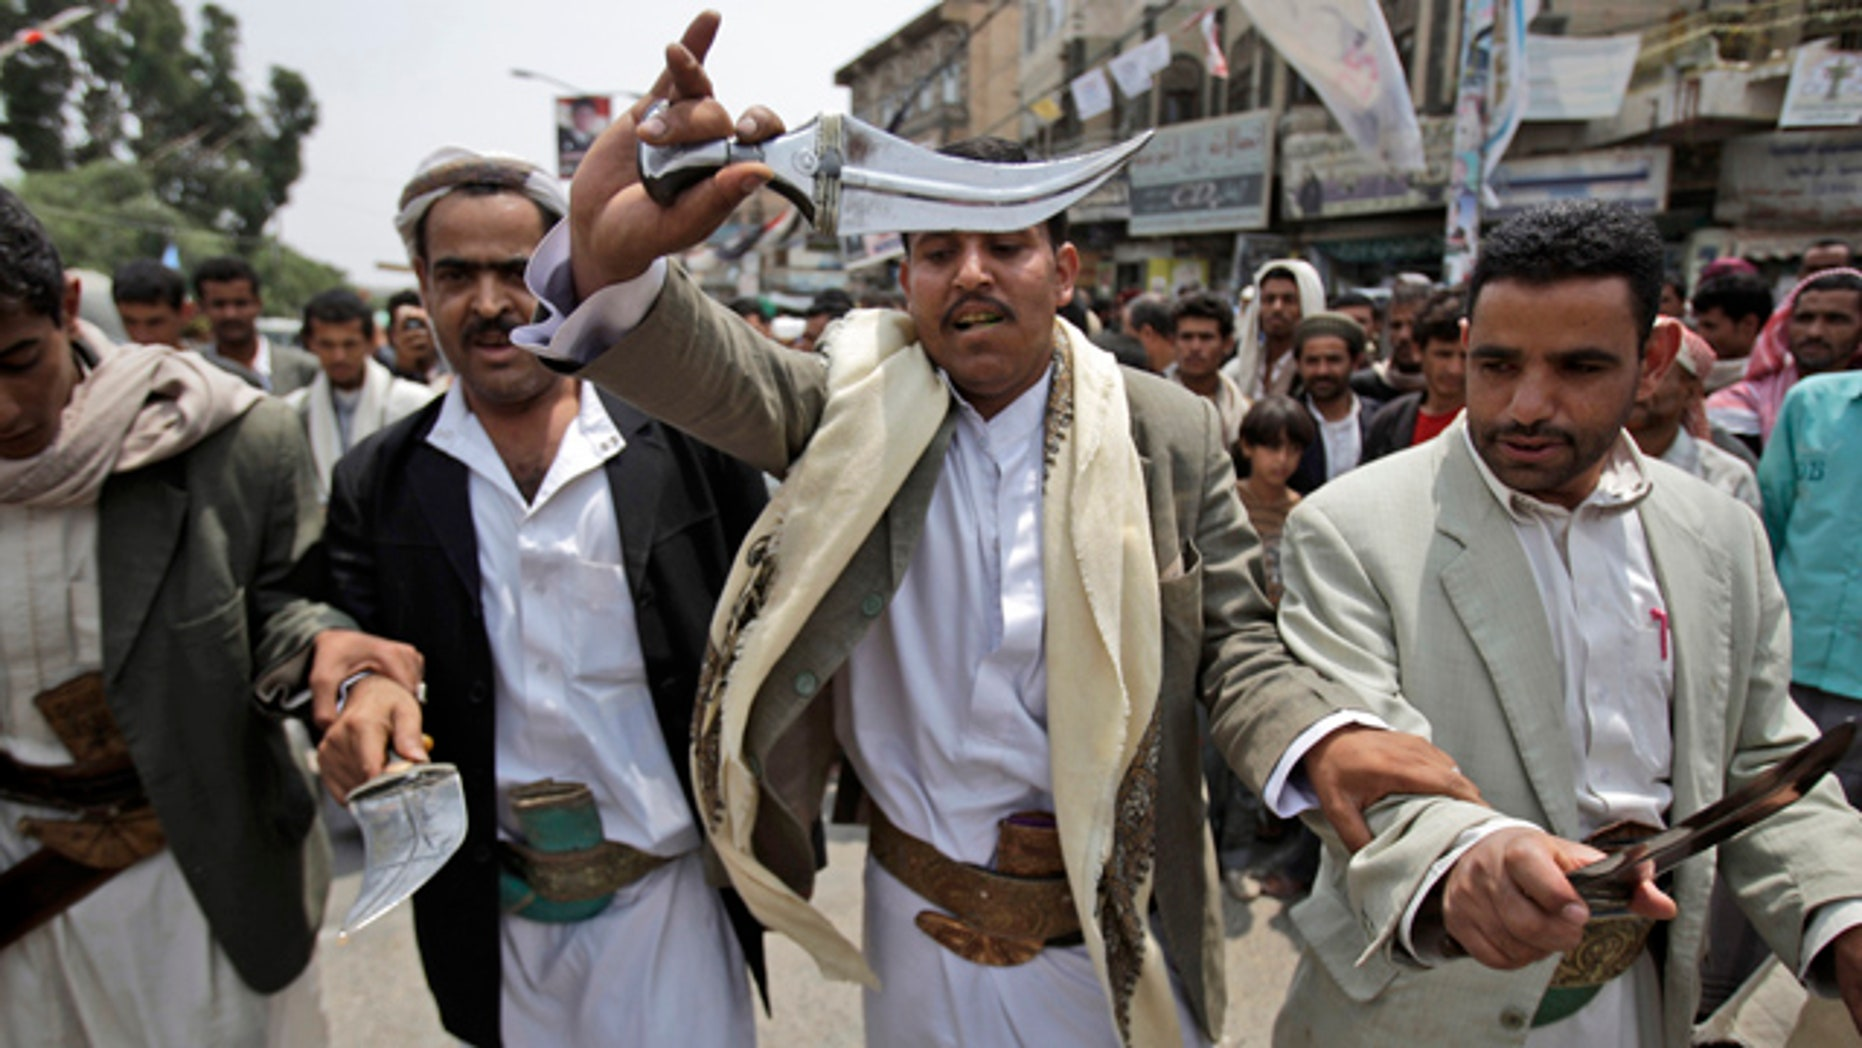 June 28: Anti-government protestors dance holding their daggers during a demonstration demanding the resignation of Yemeni President Ali Abduallah Saleh, in Sanaa, Yemen.